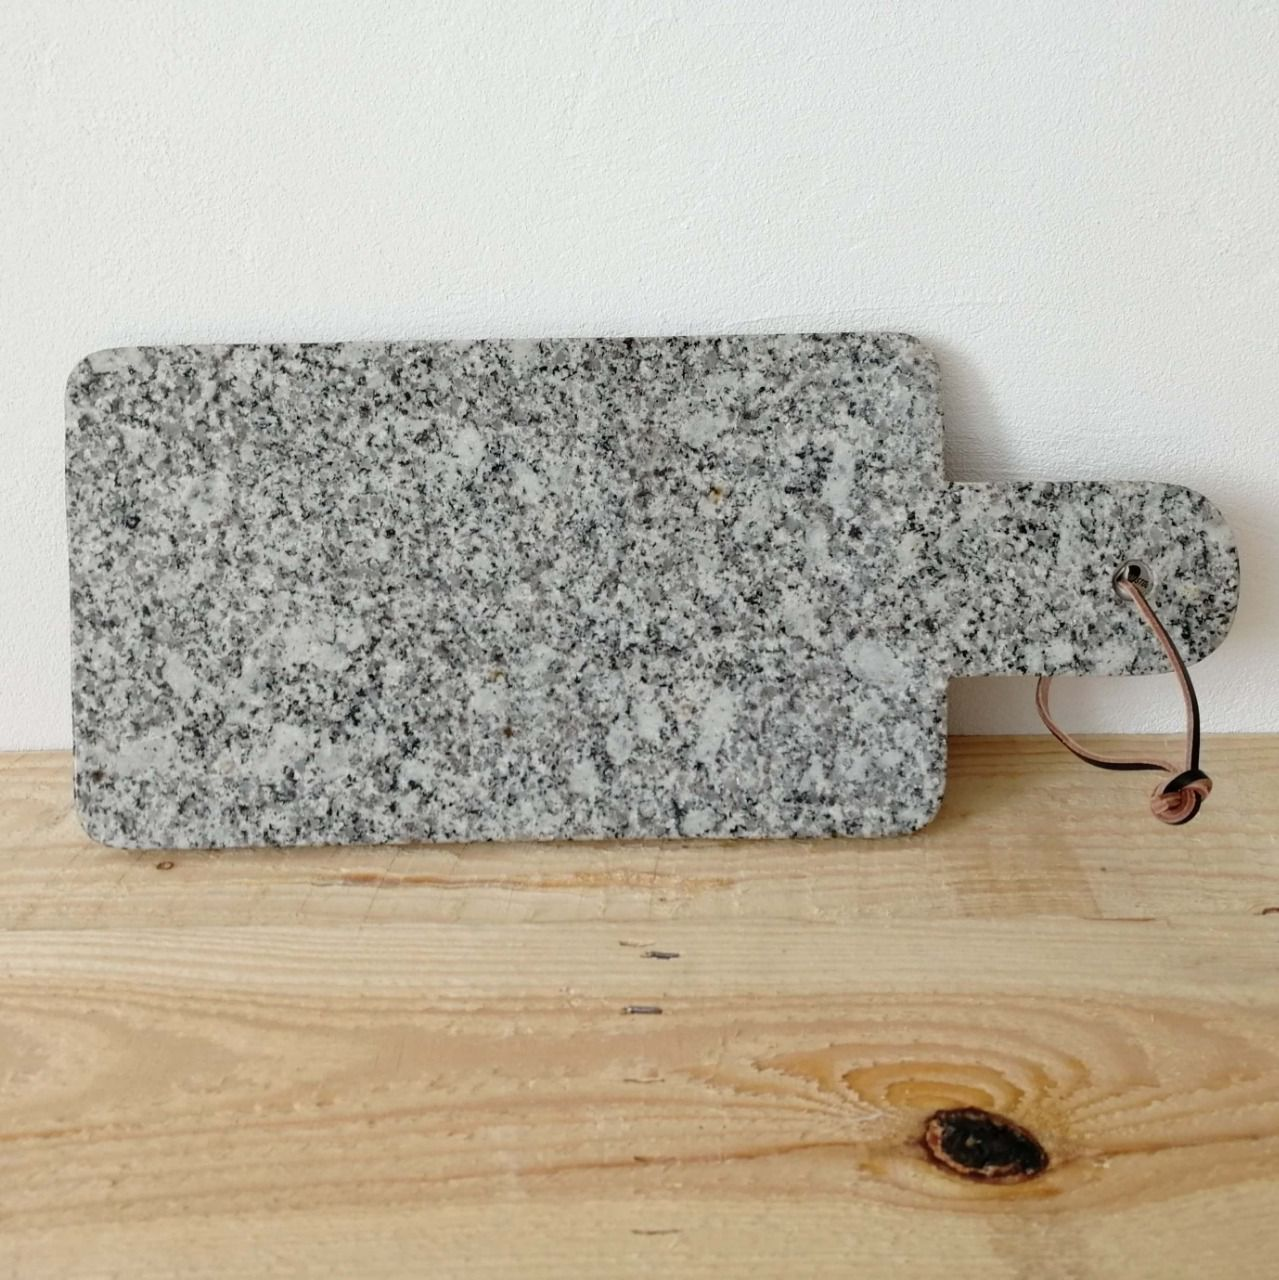 planche d couper en granit. Black Bedroom Furniture Sets. Home Design Ideas